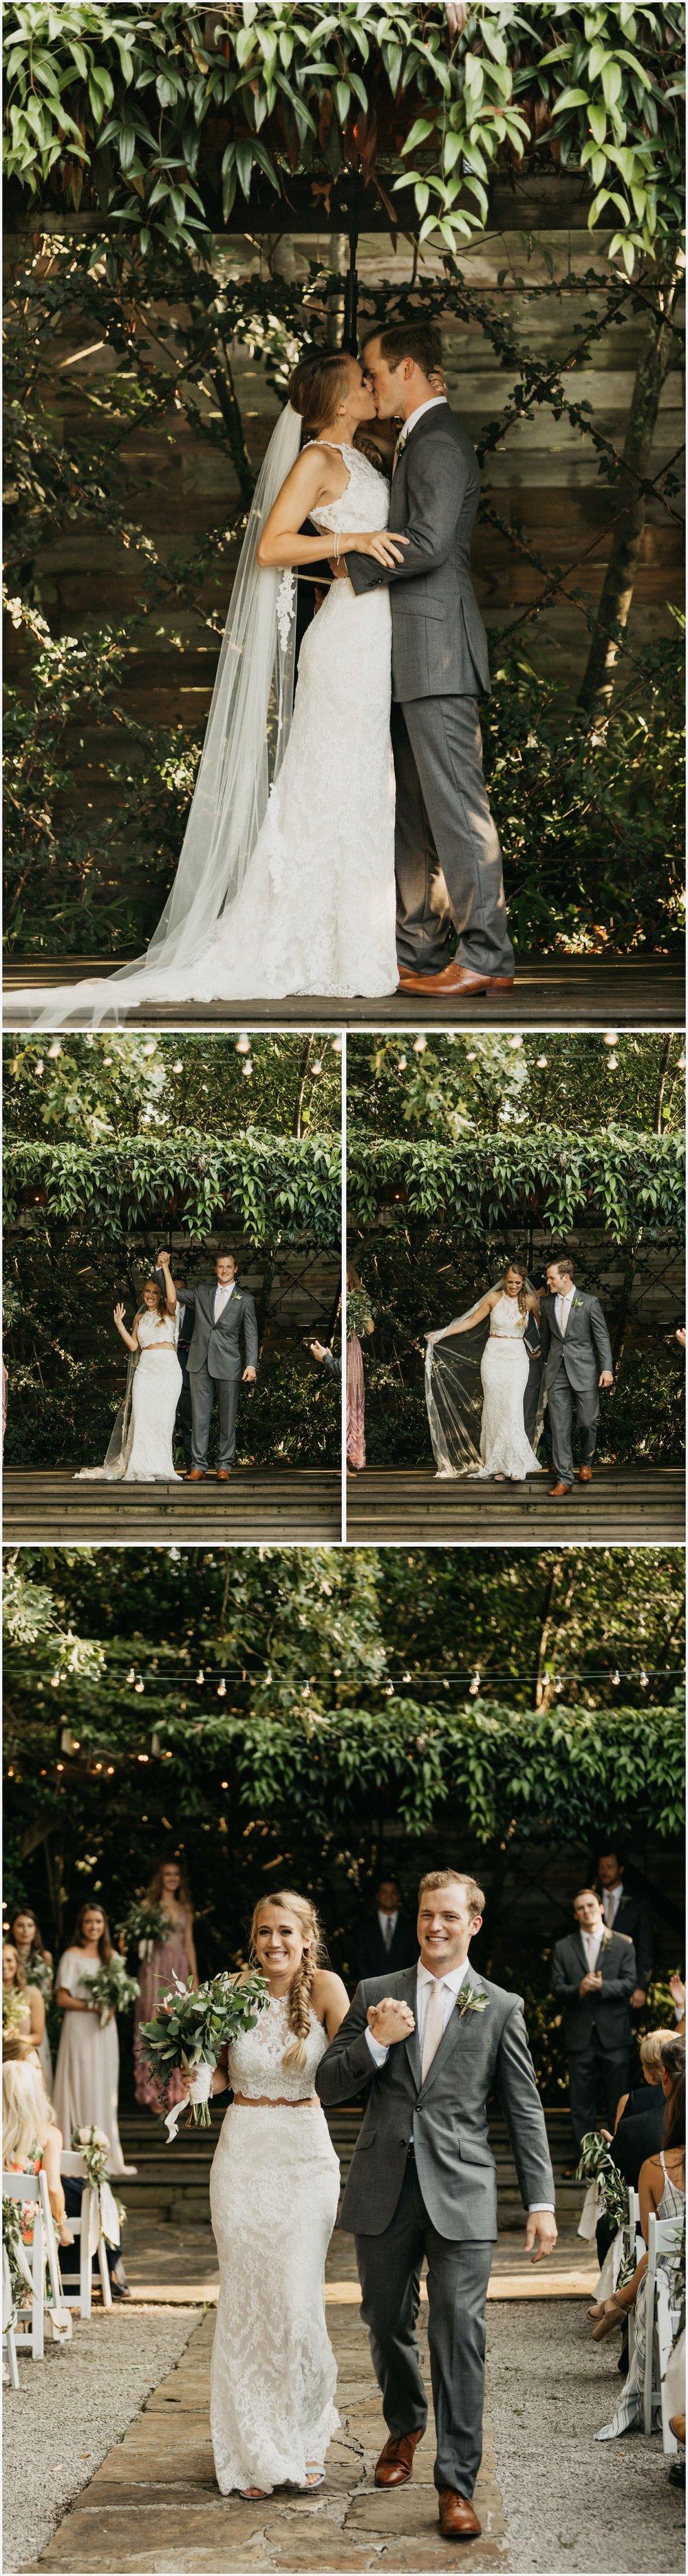 Gabrella Manor Wedding Birmingham Alabama_0039.jpg